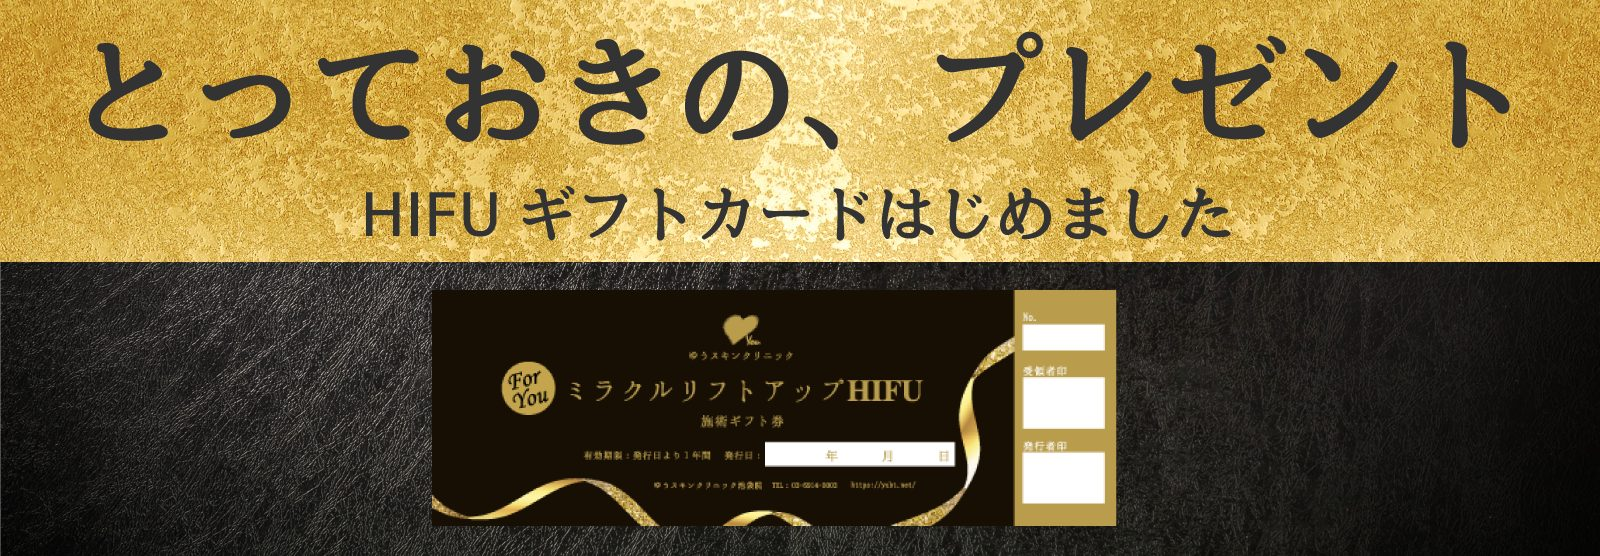 HIFU(ハイフ)ギフトカード発売中|ゆうスキンクリニック